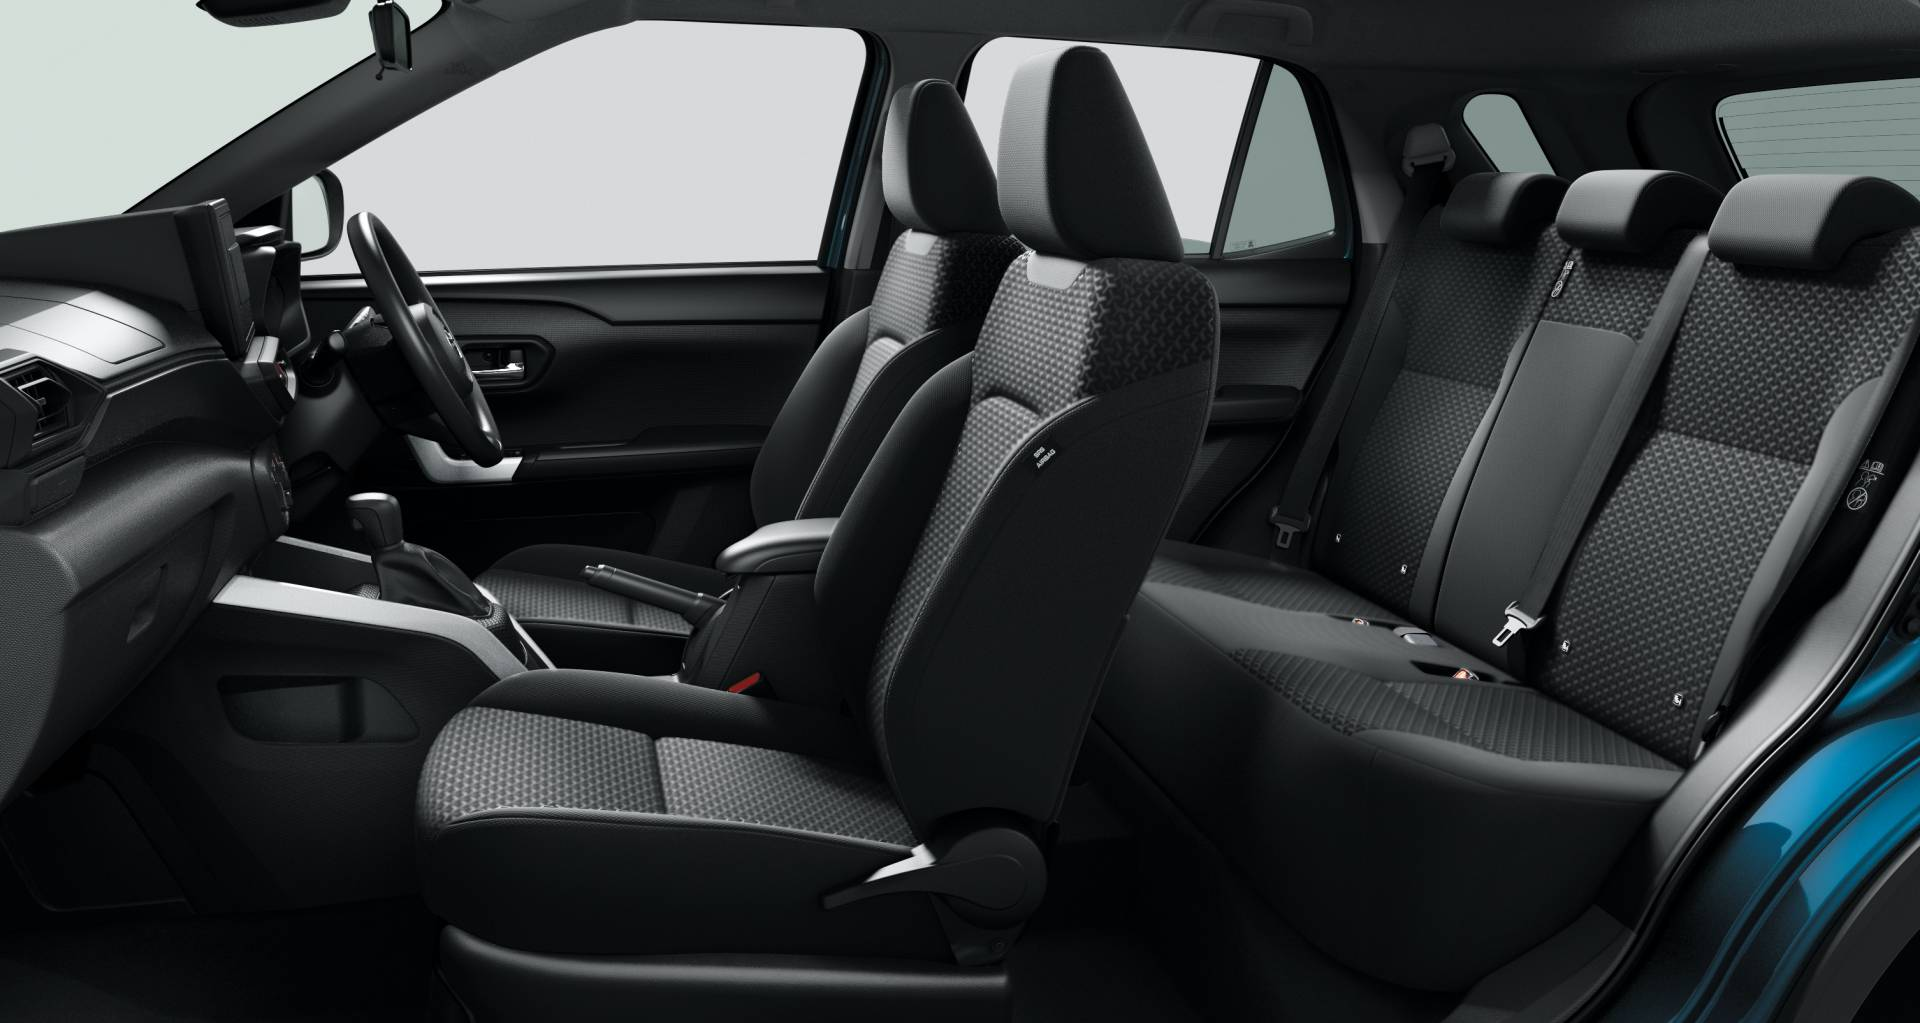 салон Toyota Raize 2020 фото